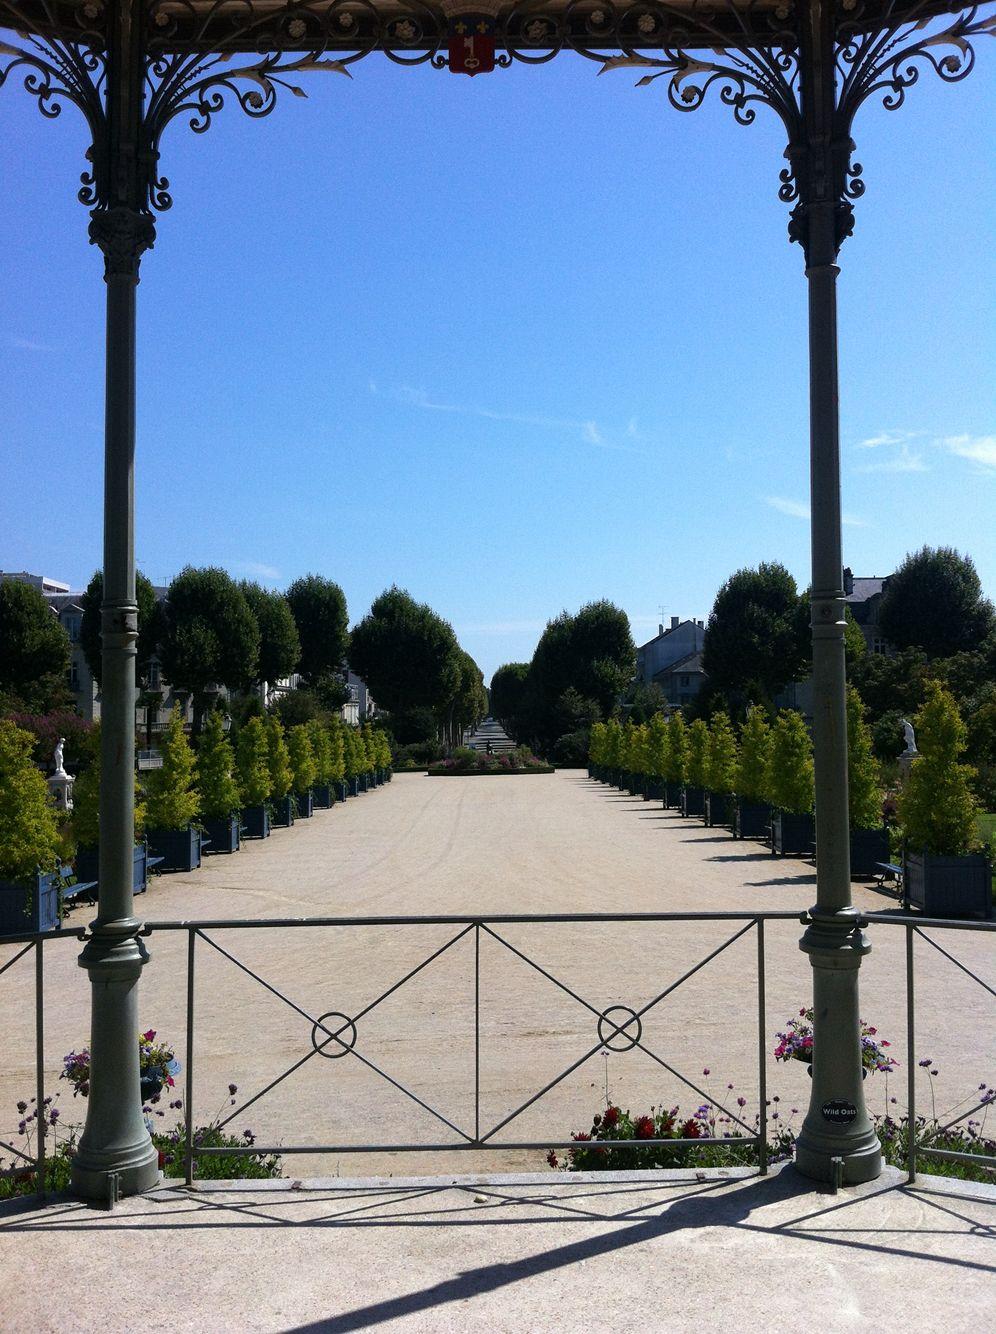 Angers - Jardin du Mail vu du Kiosque à musique | Angers | Pinterest ...